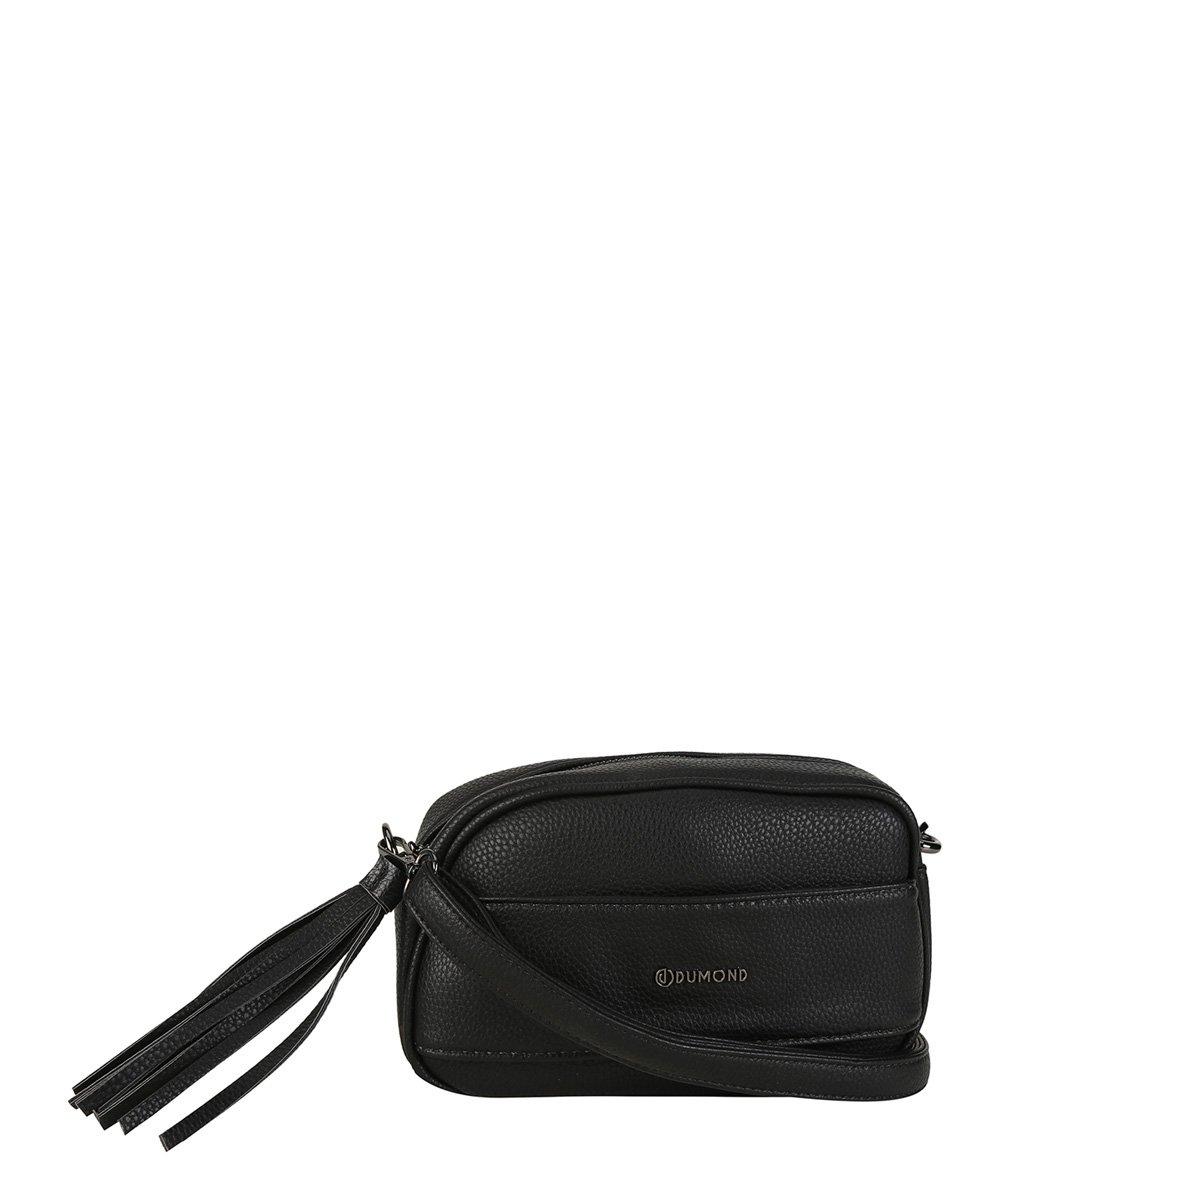 49322b133 Bolsa Dumond Mini Bag Transversal Soft Relax Feminina | Livelo -Sua ...